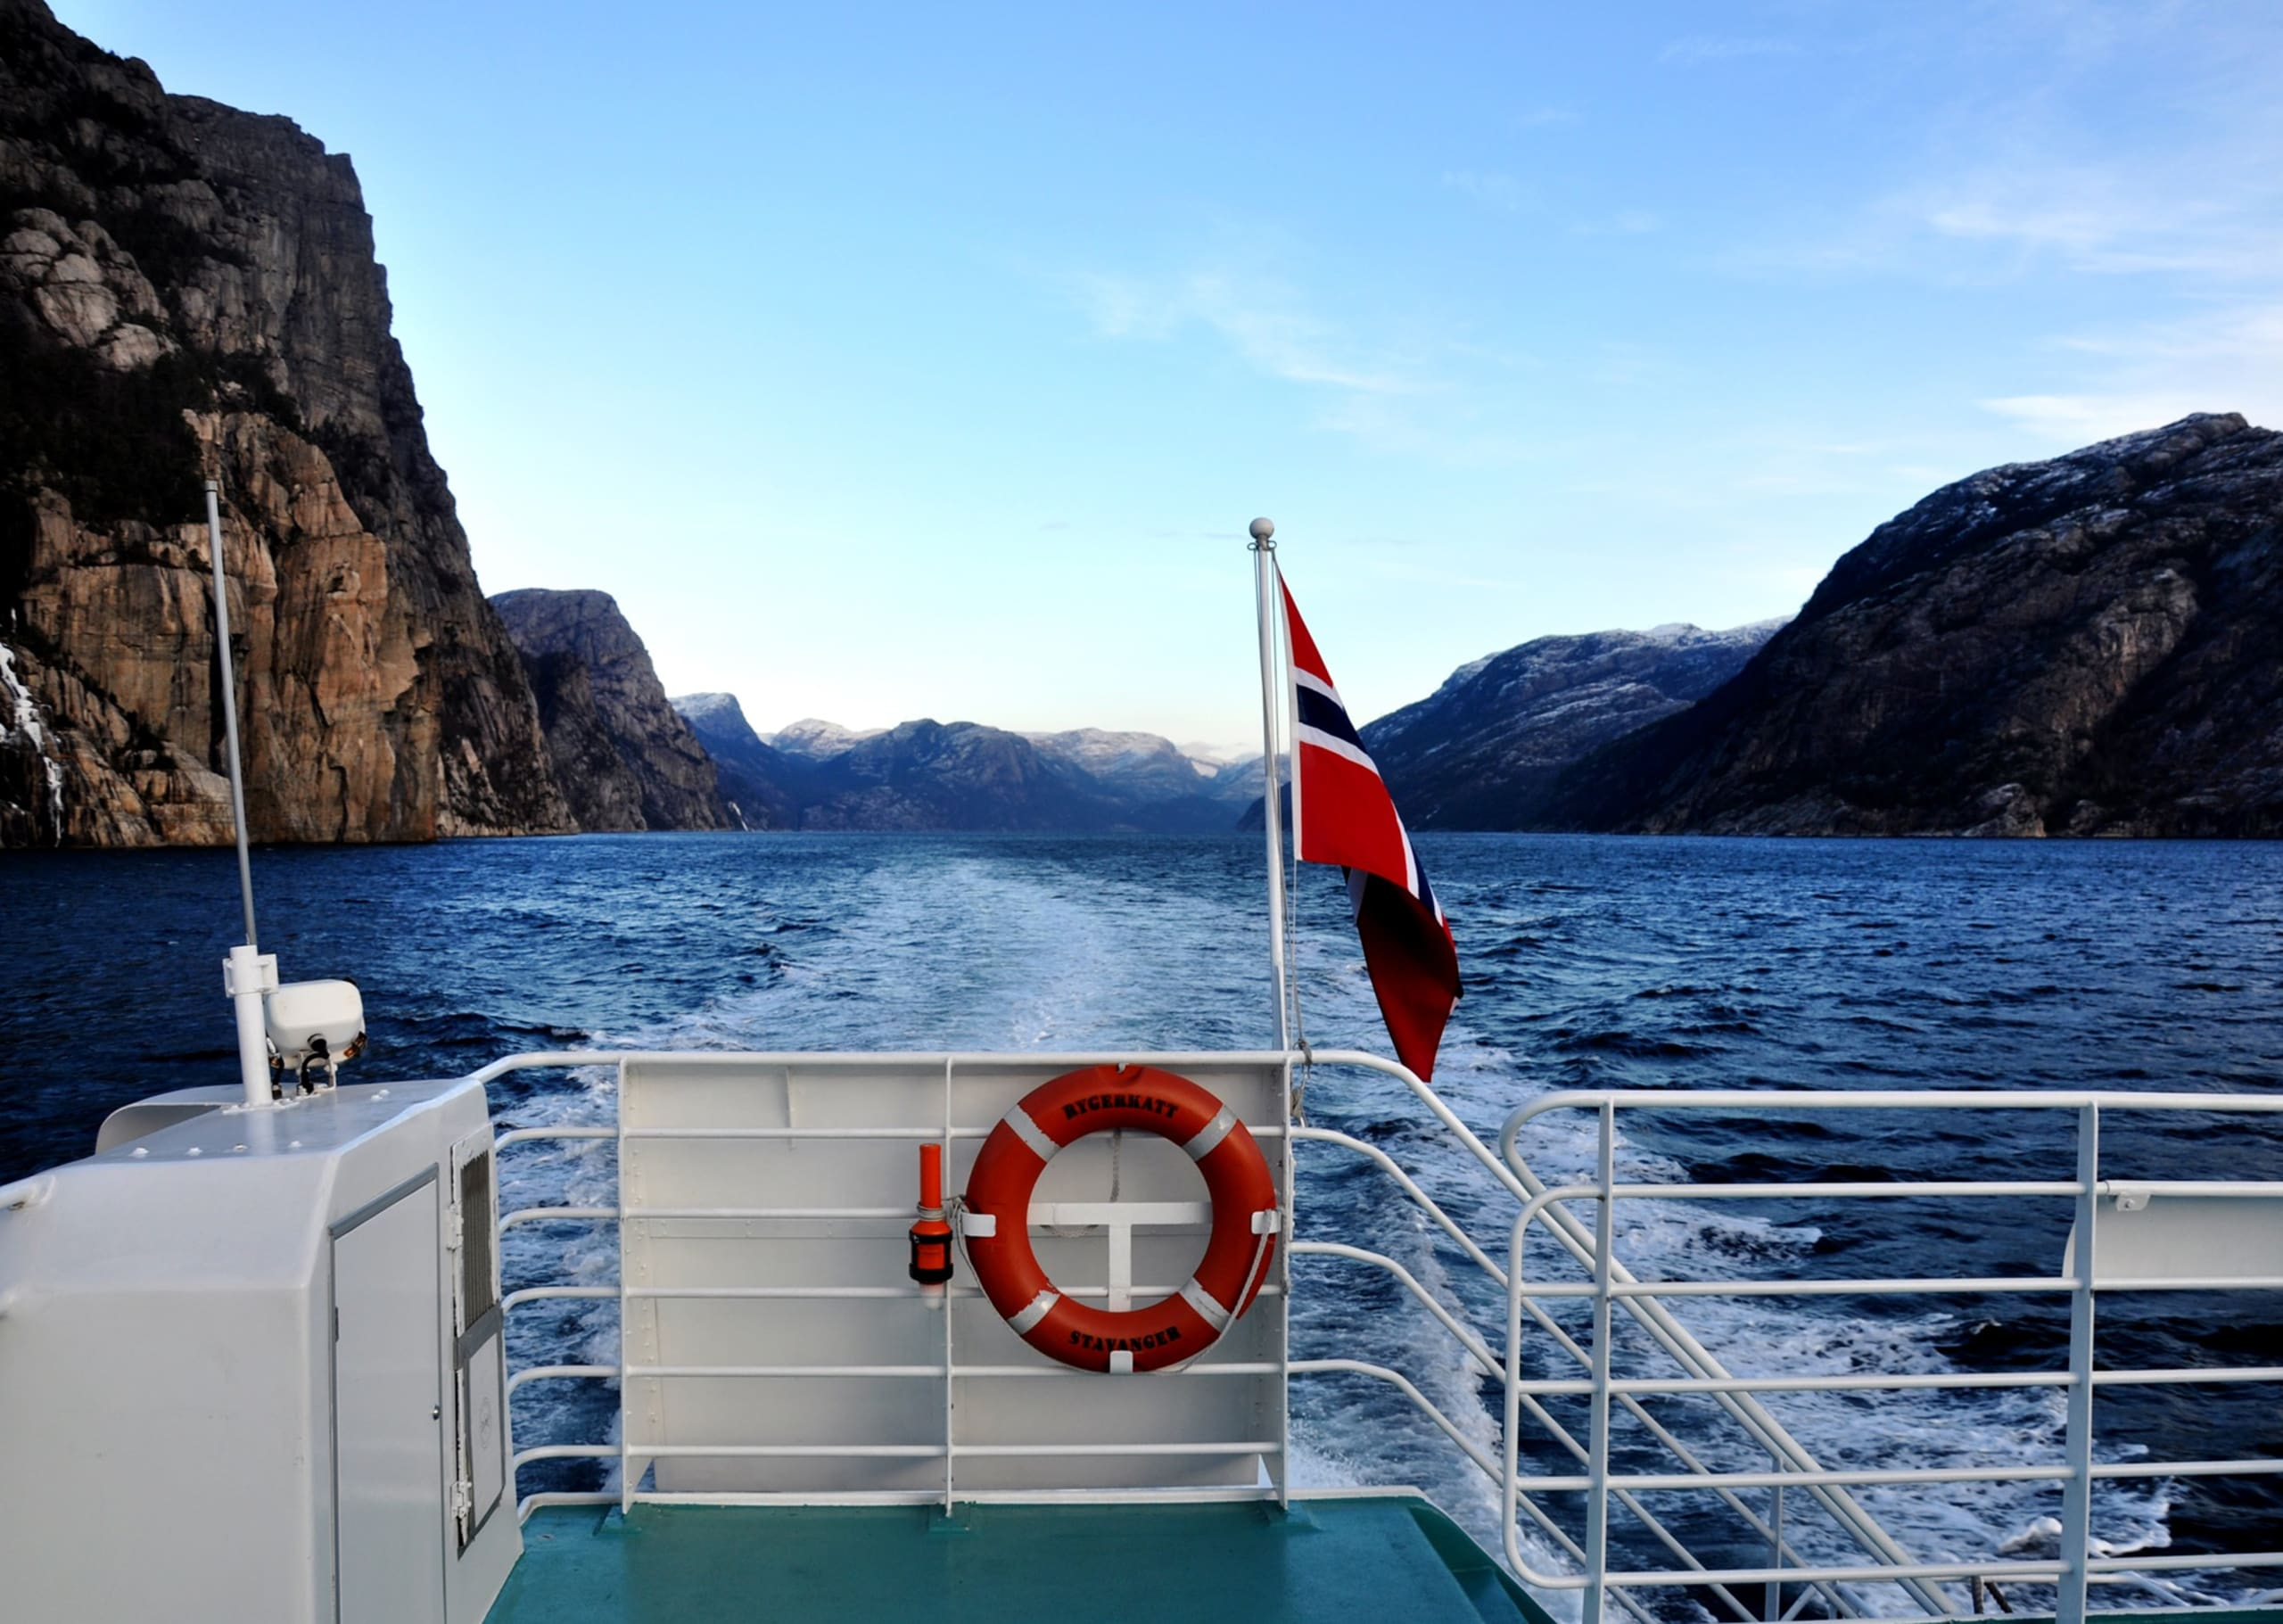 Lysefjord seen from Rygerelektra